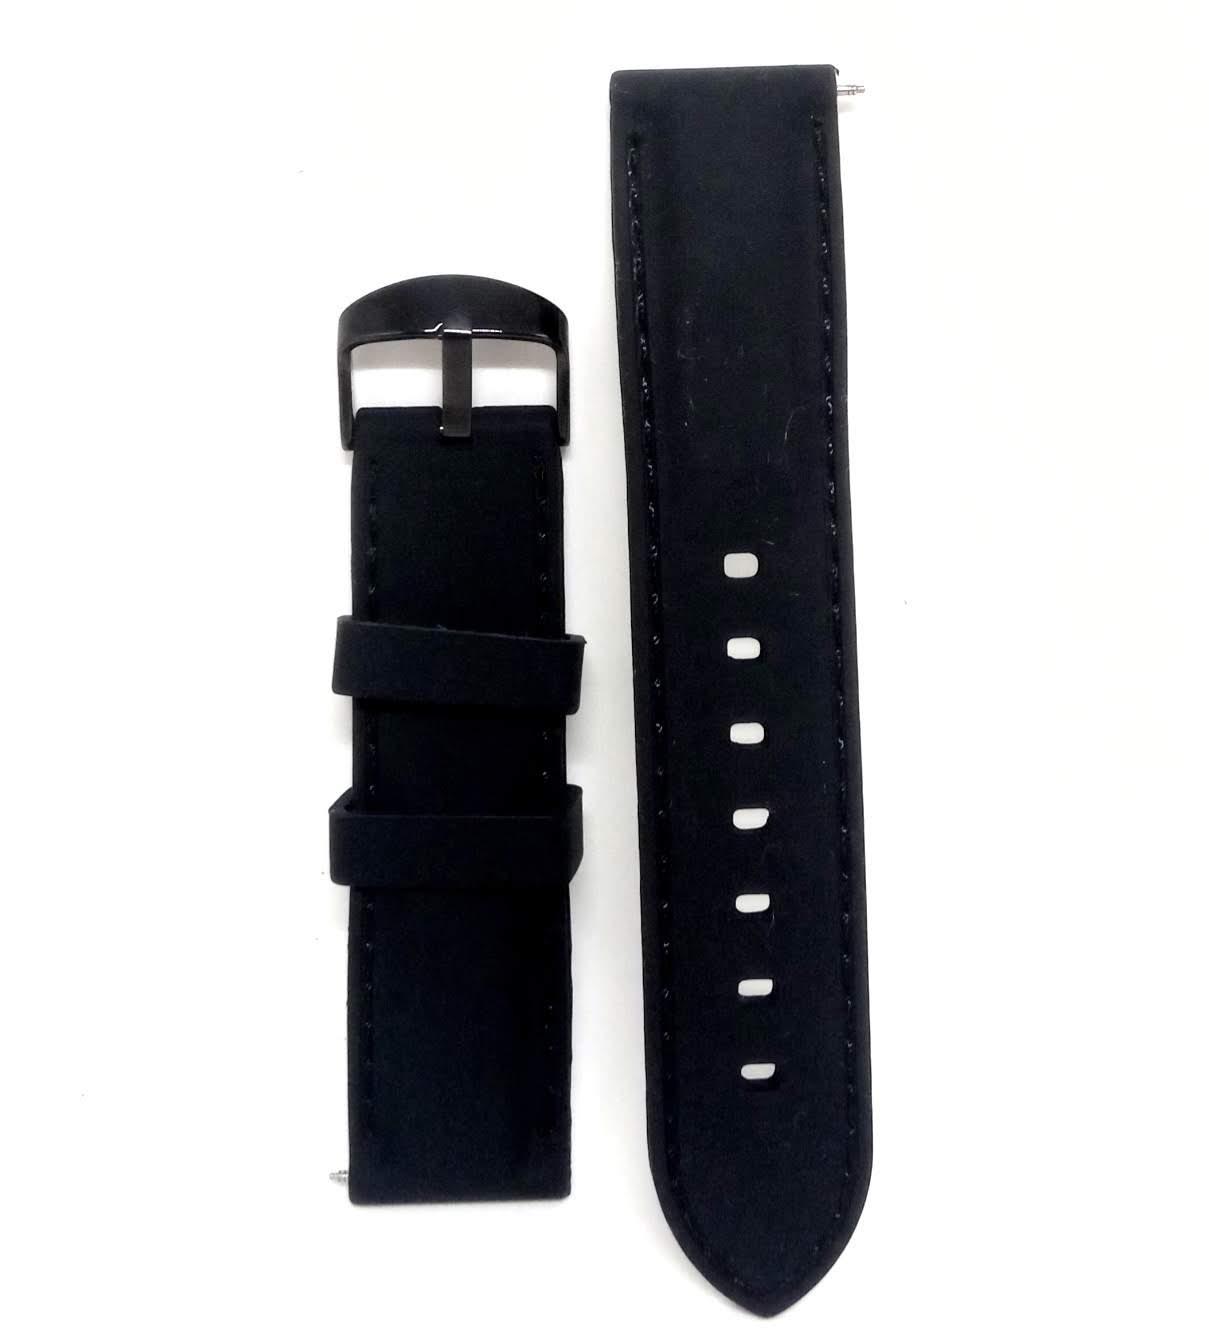 Pulseira Relógio Borracha Silicone 22cm 22mm